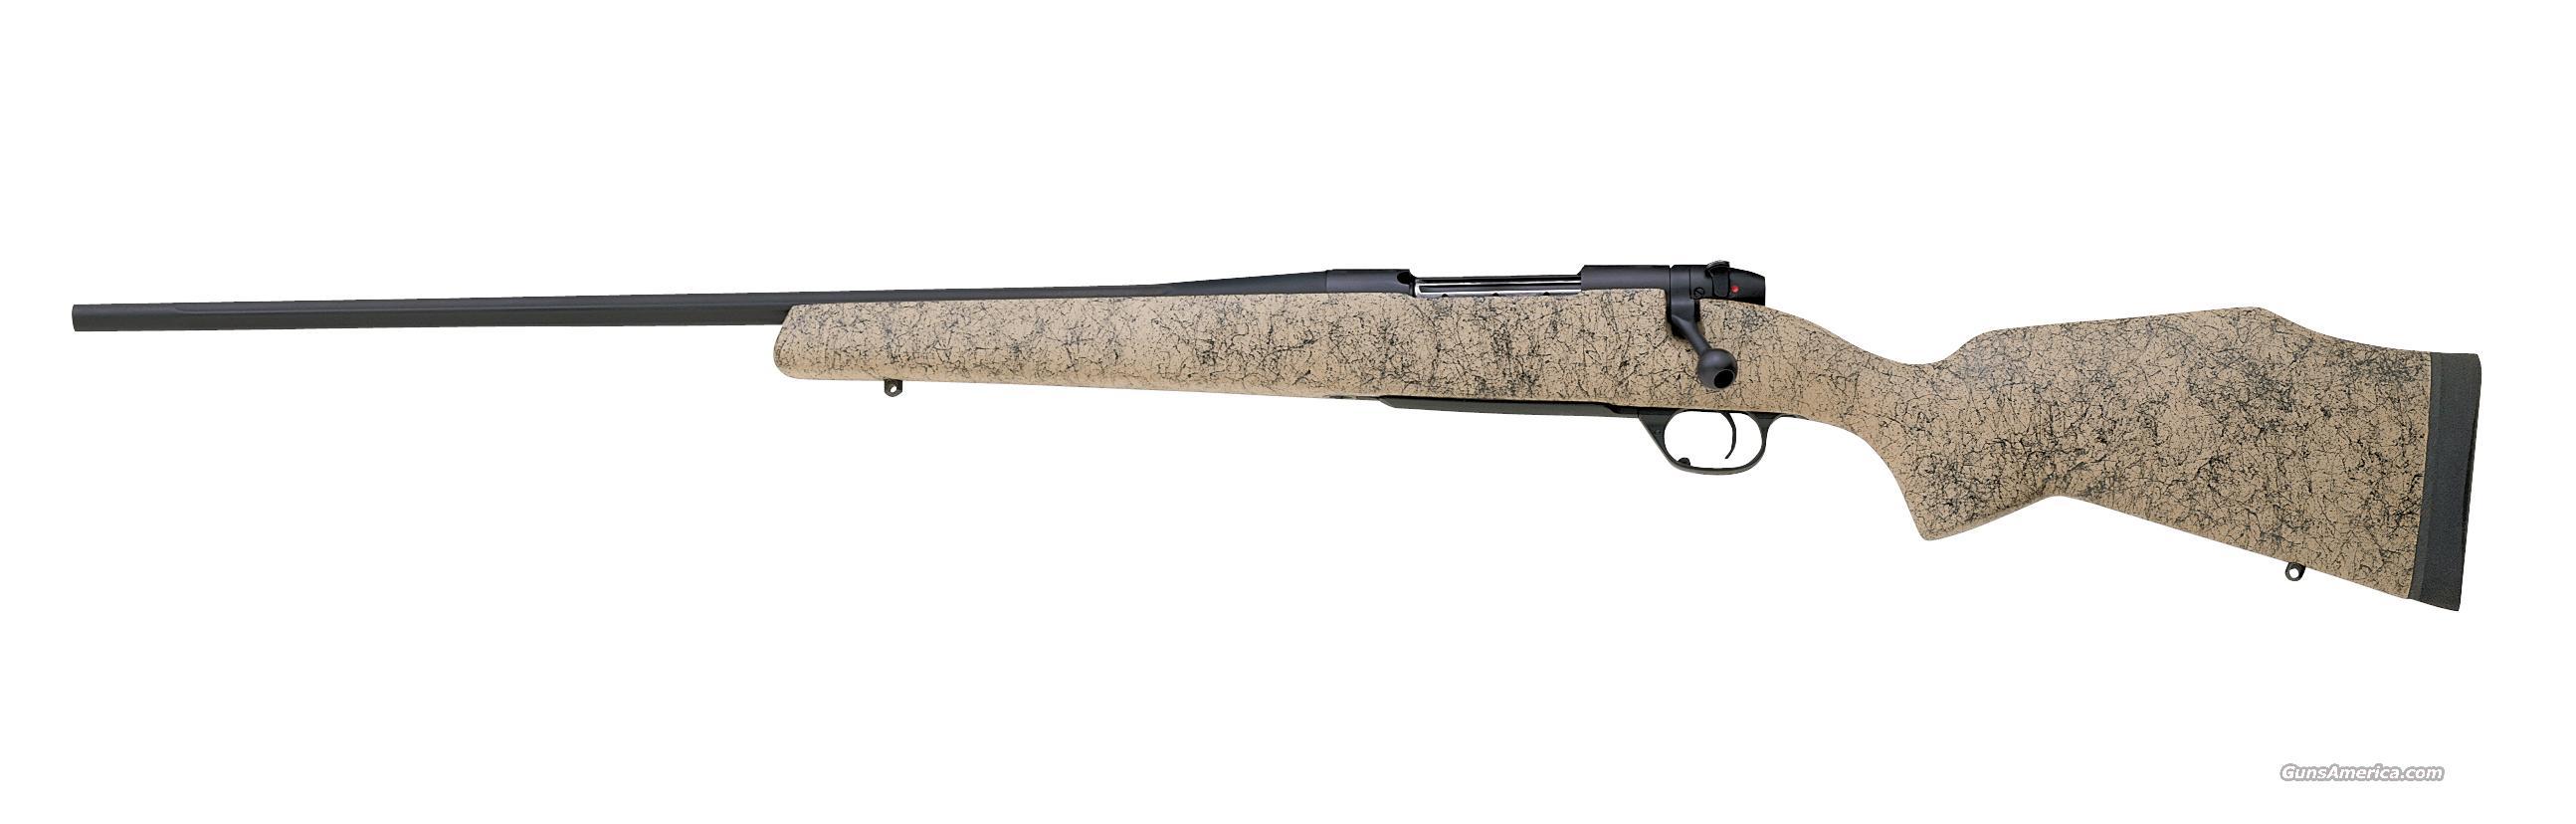 Wby MKV Ultra Lightweight LEFT HAND 300  Guns > Rifles > Weatherby Rifles > Sporting